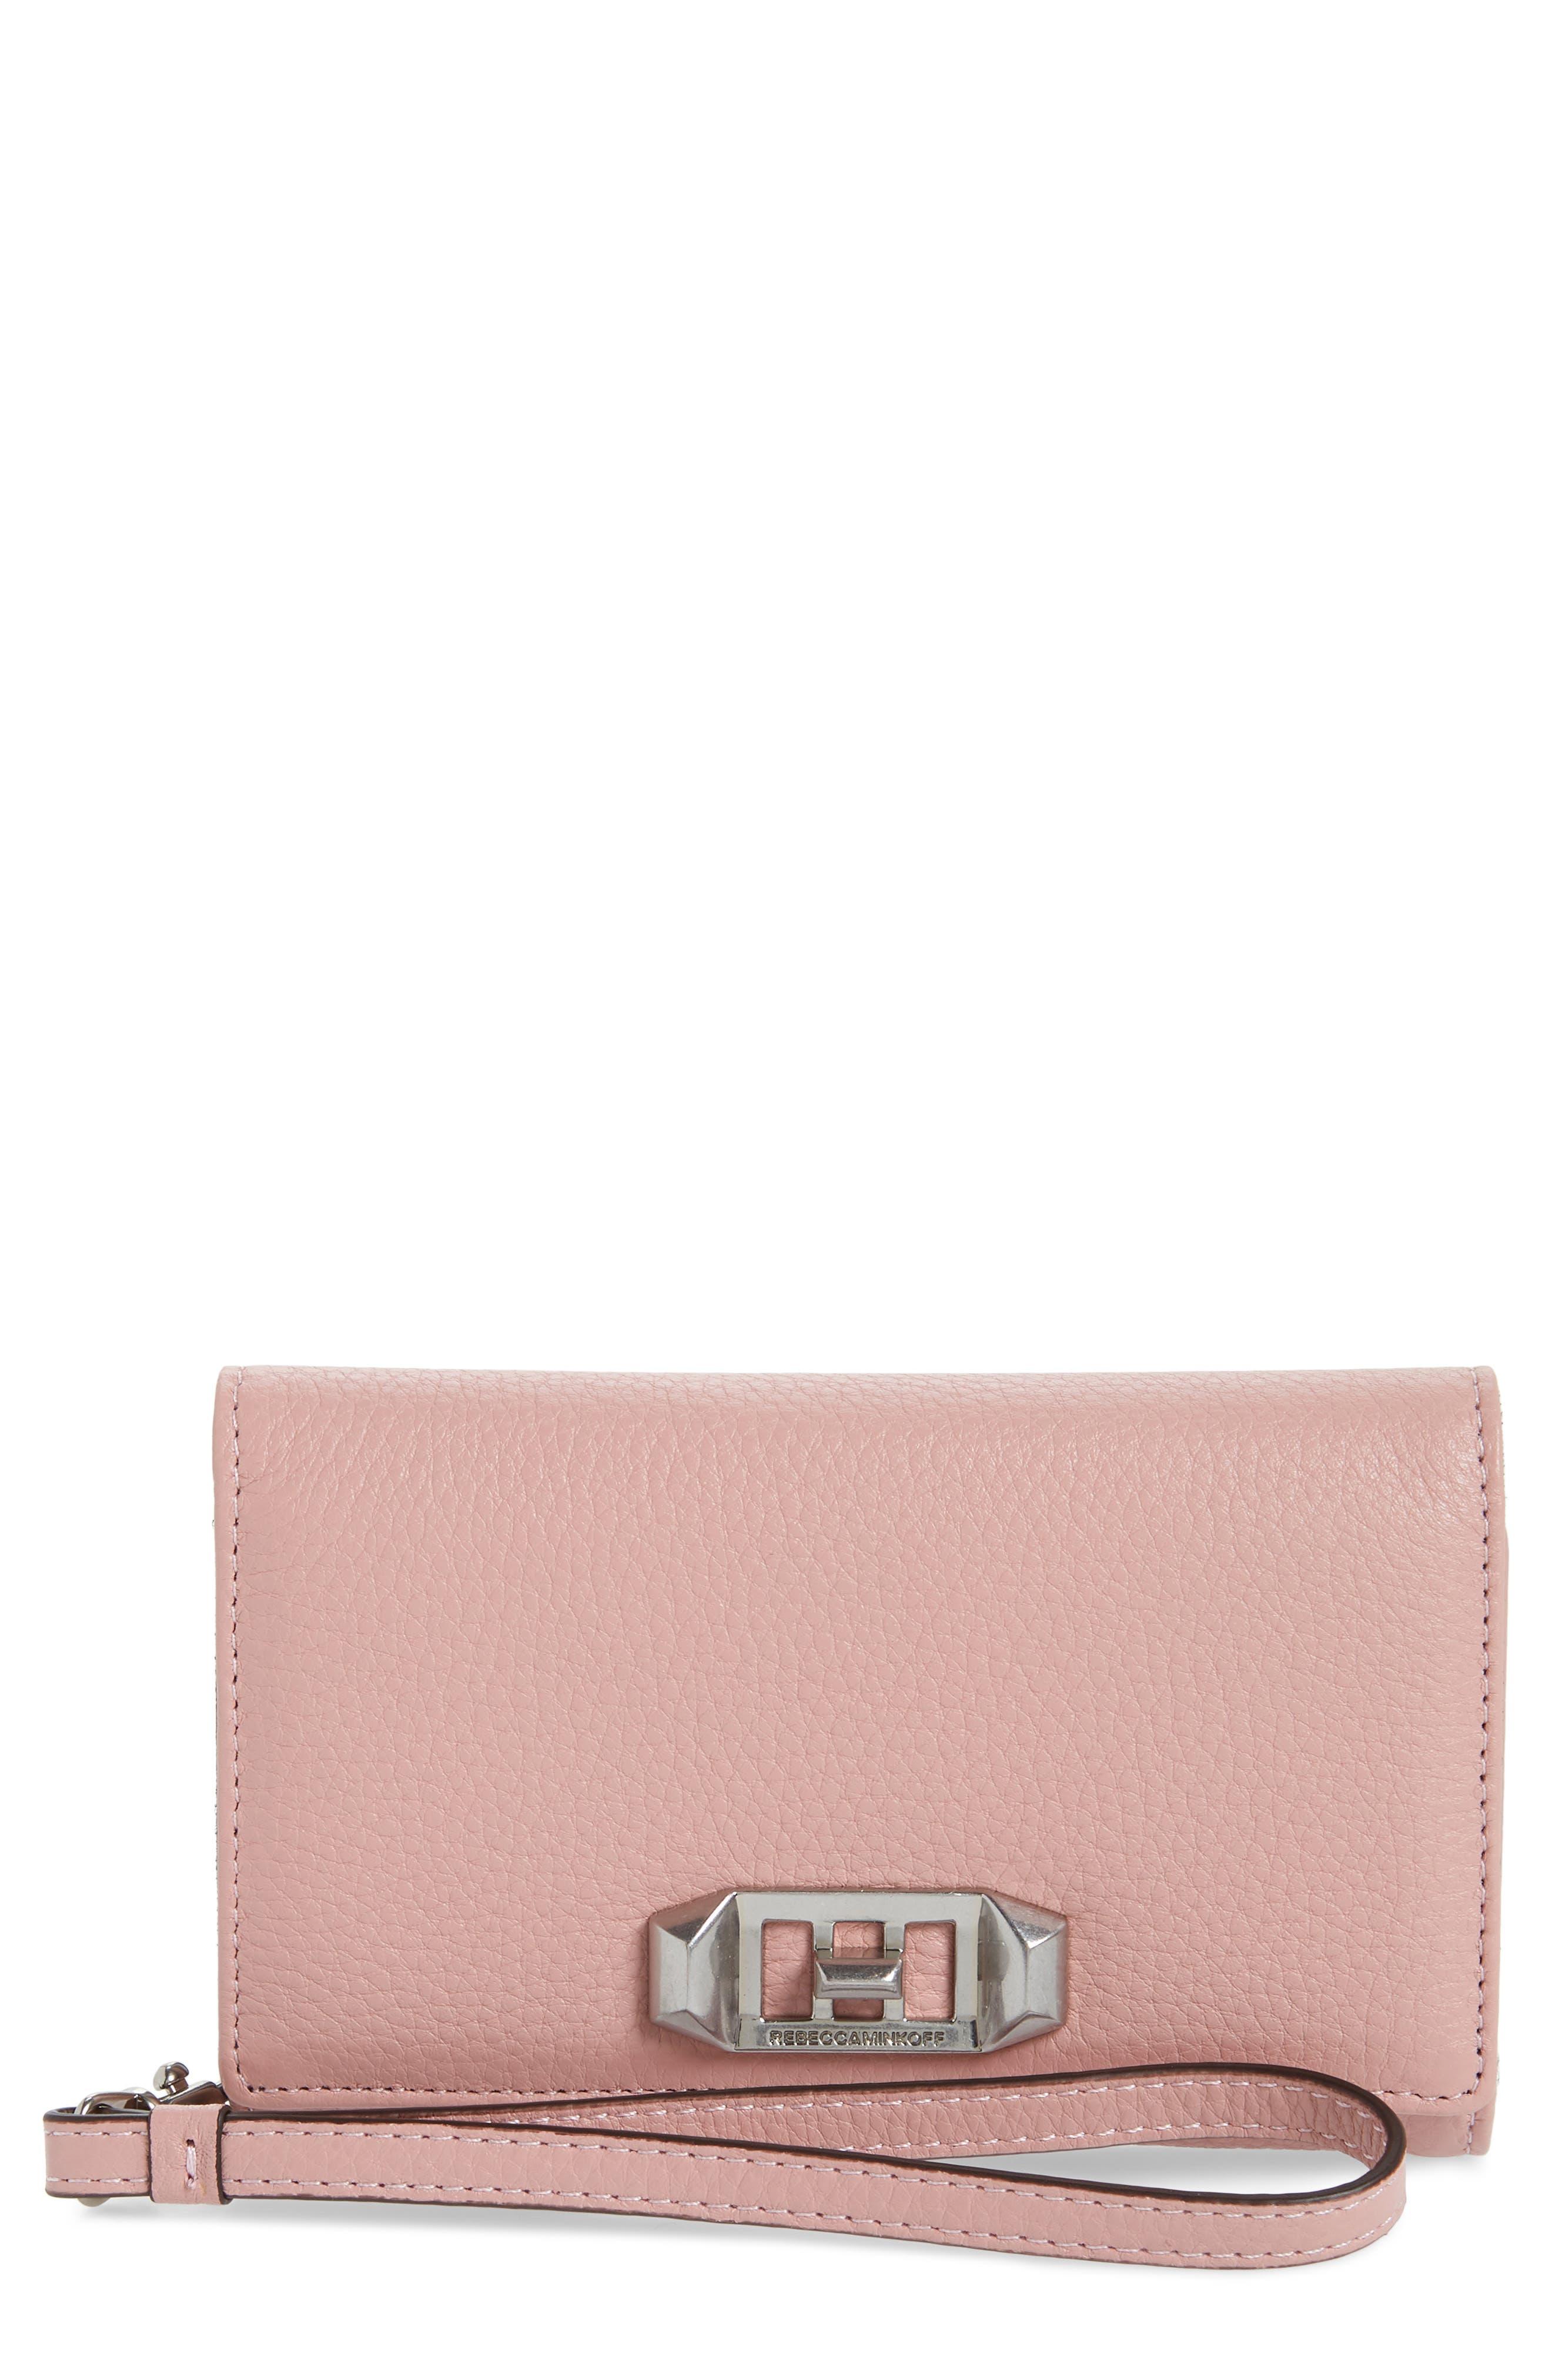 Alternate Image 1 Selected - Rebecca Minkoff Love Lock iPhone 7/8 & 7/8 Plus Leather Wristlet Folio